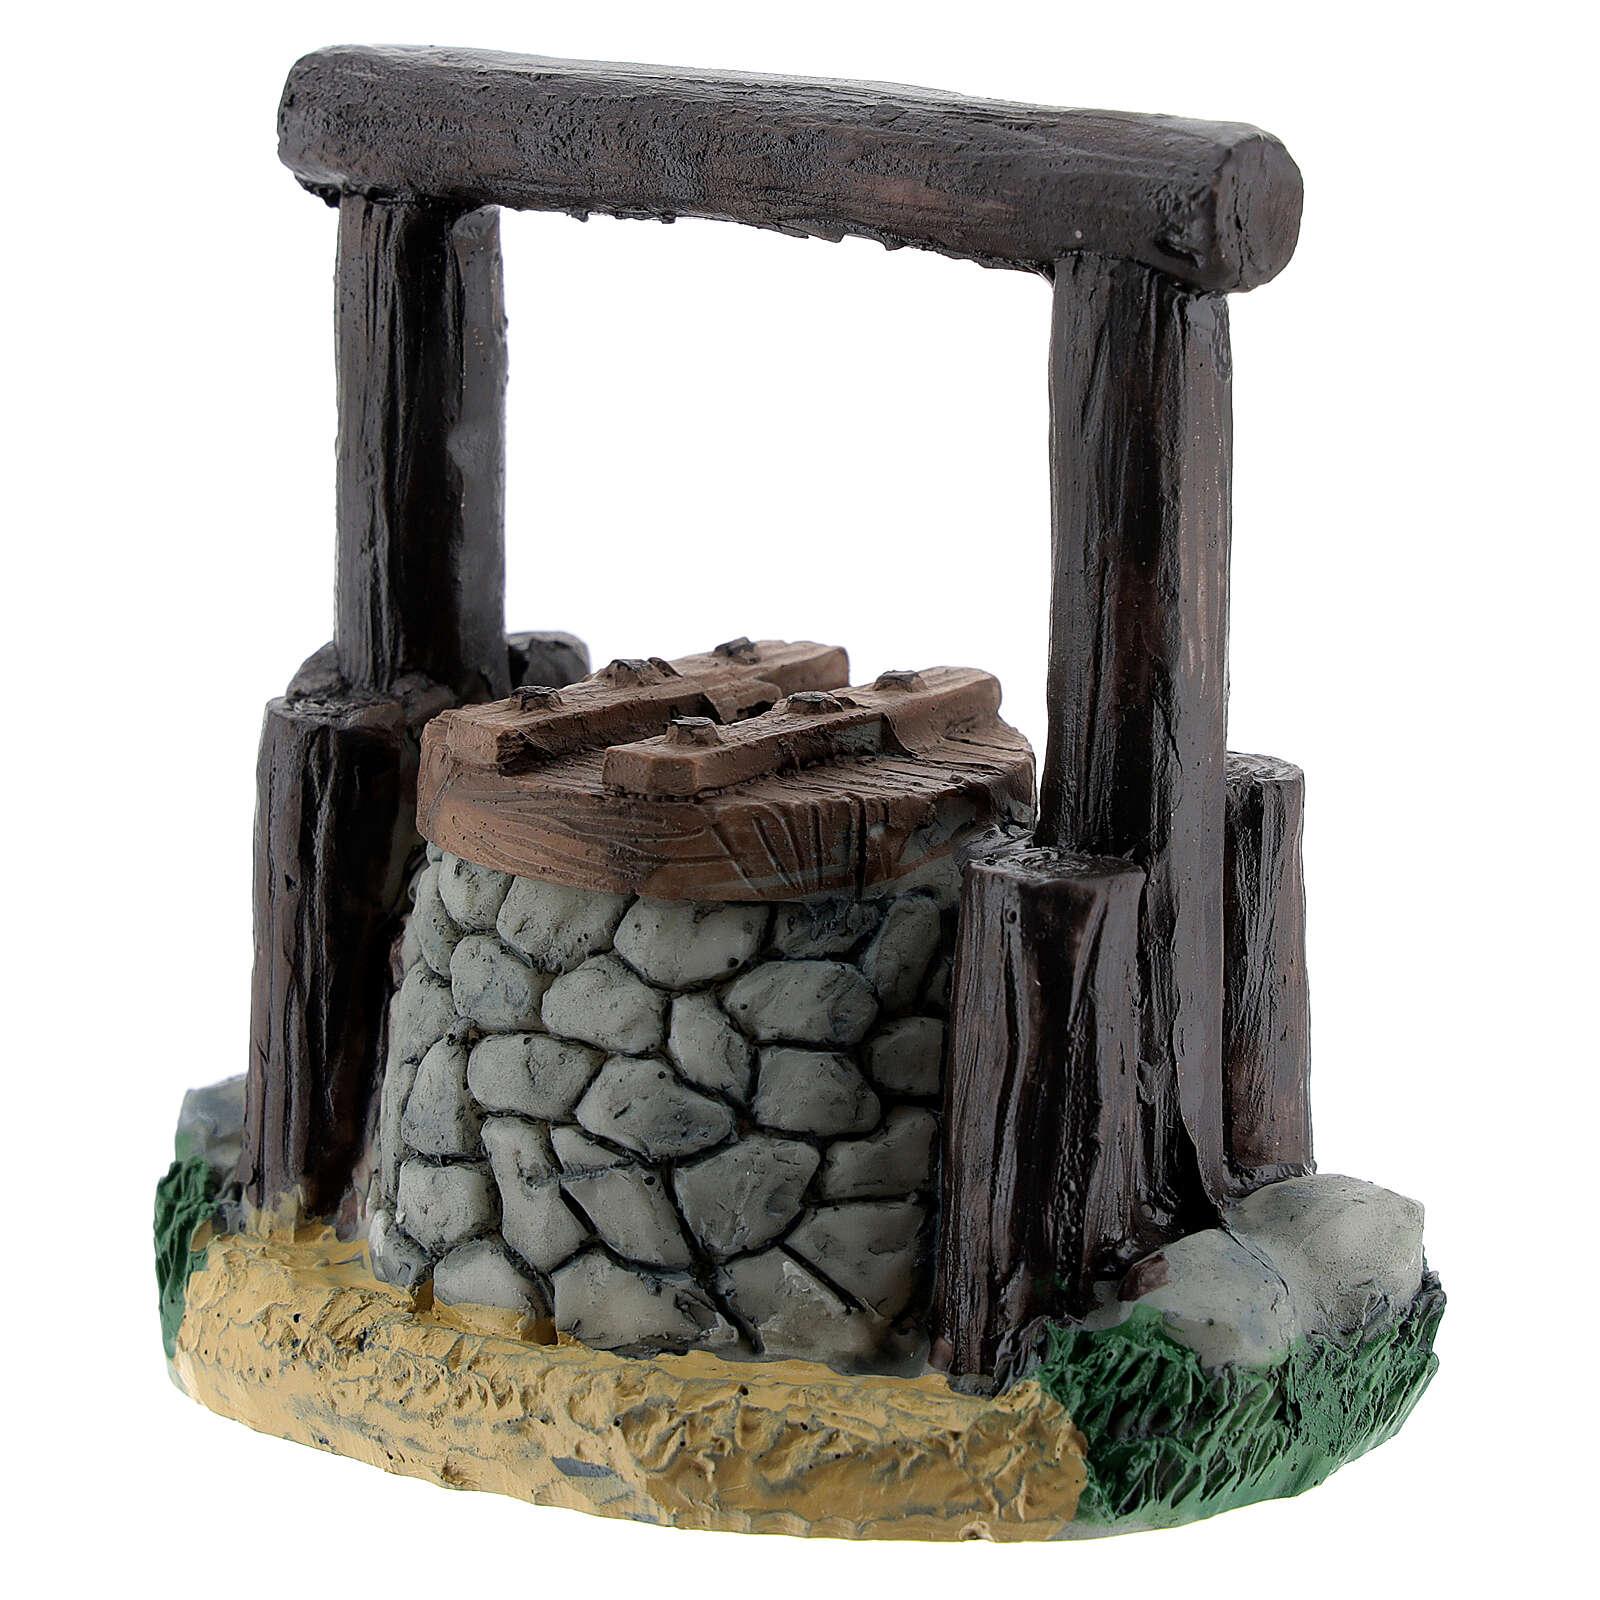 Resin waterhole 7 cm for Nativity Scene with 8-10 cm figurines 4